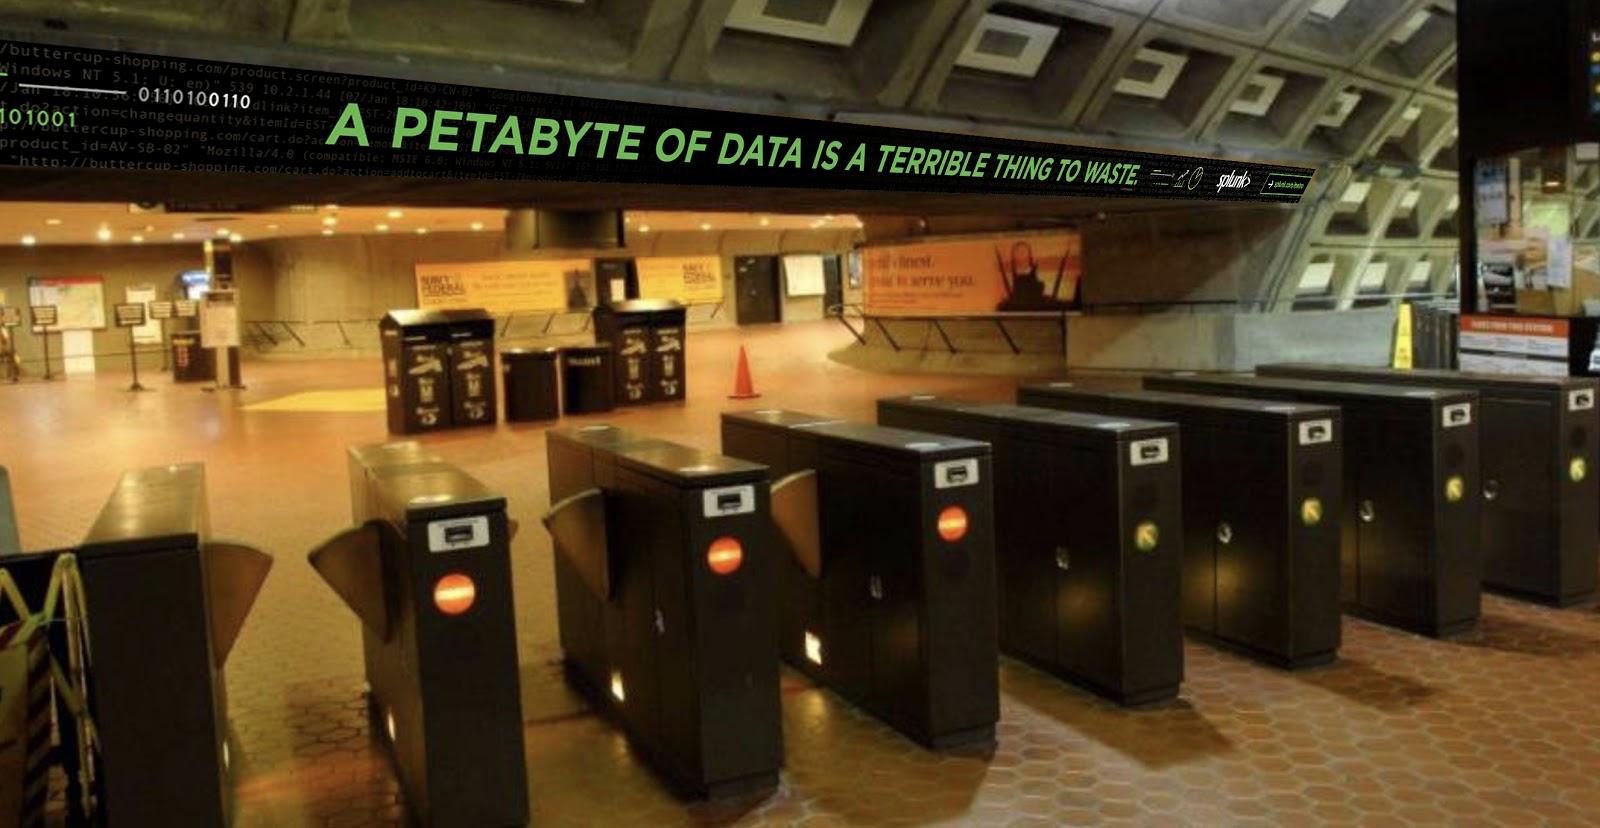 SPLUNK-DC-Metro-Pentagon-Station_Takeover-596x18.5.jpg